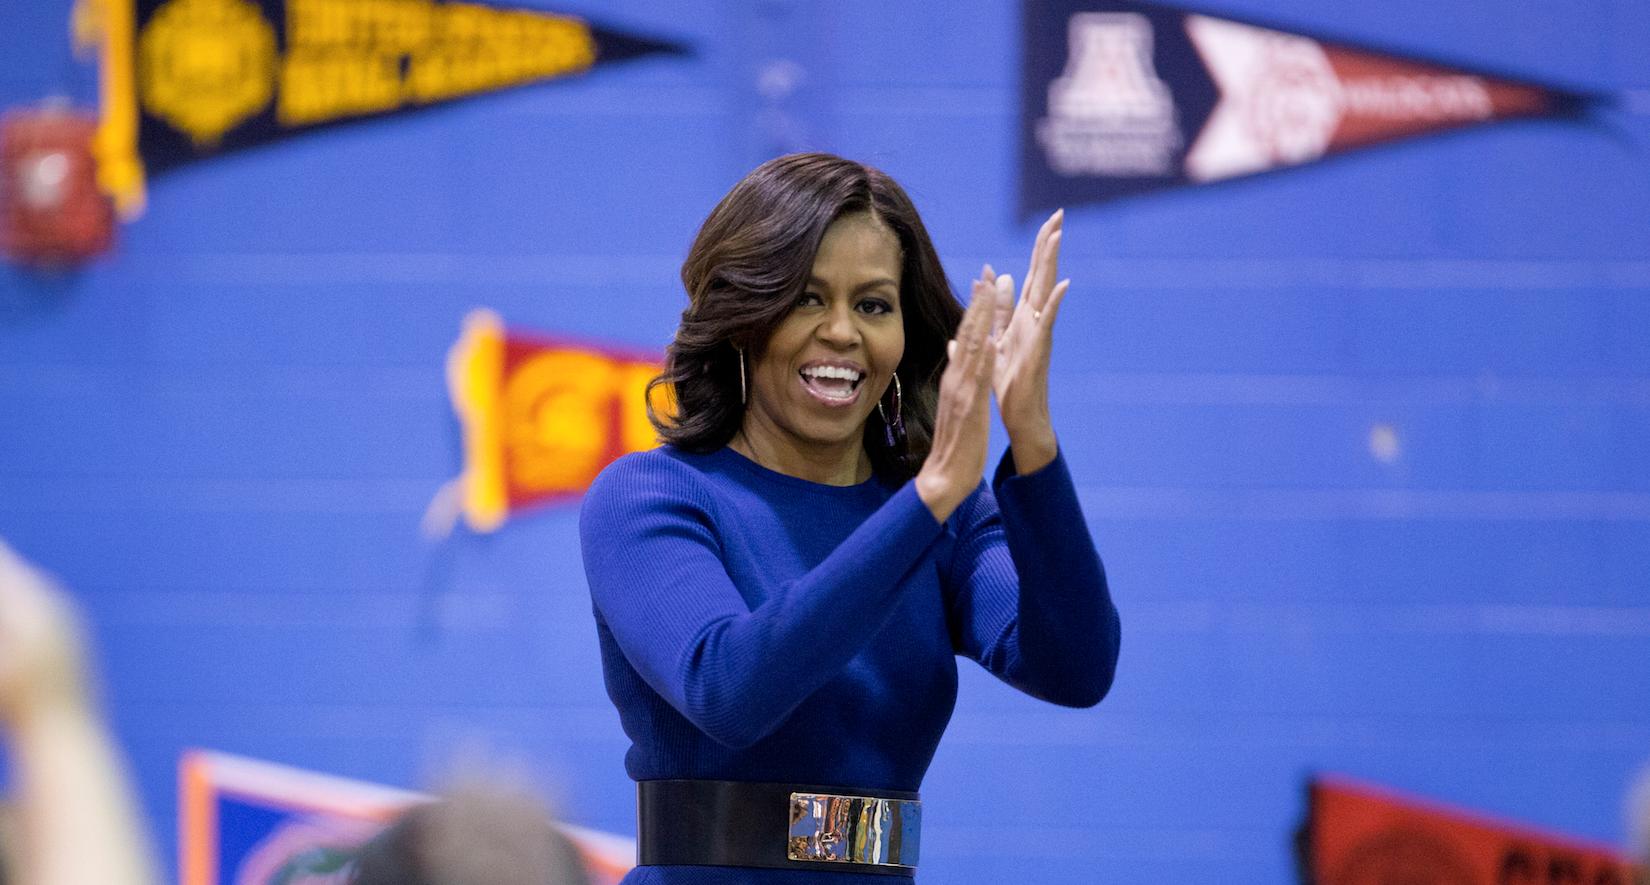 Fotos de michele obama 39